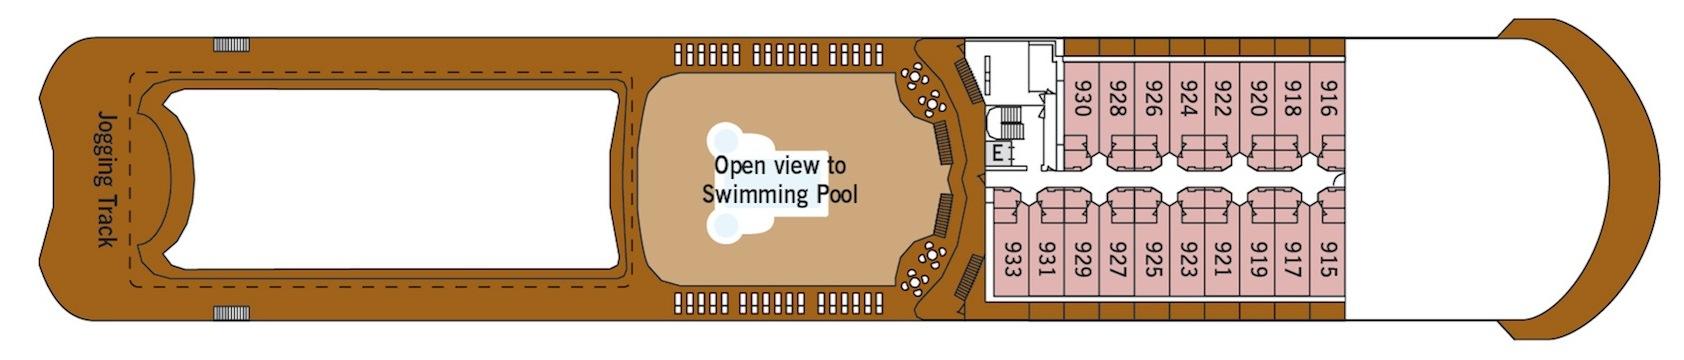 Silversea Cruises Silver Shadow Deck Plans Deck 9.jpg